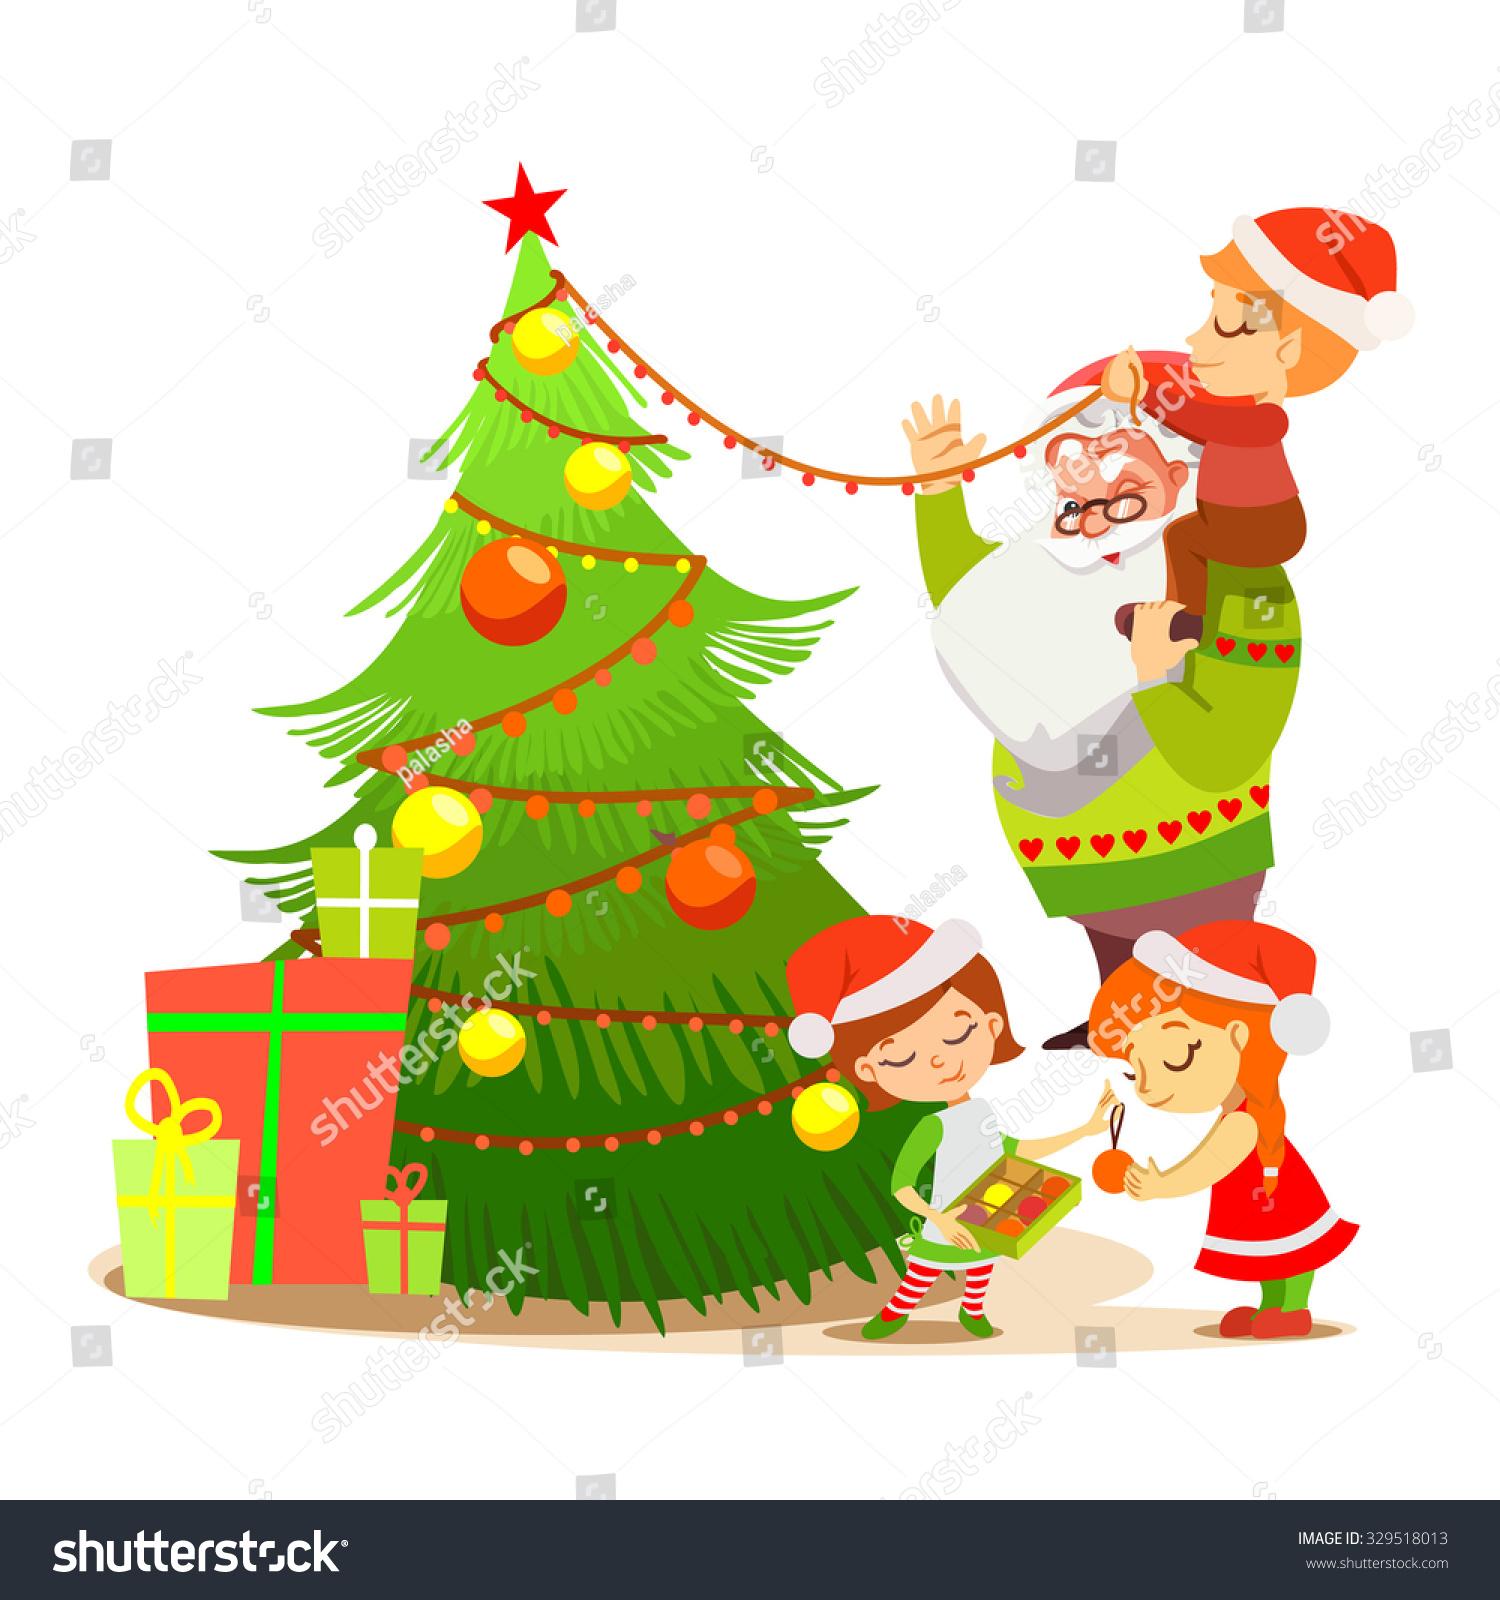 Cute Cartoon Santa Claus Decorating Christmas Stock Vector Royalty Free 329518013